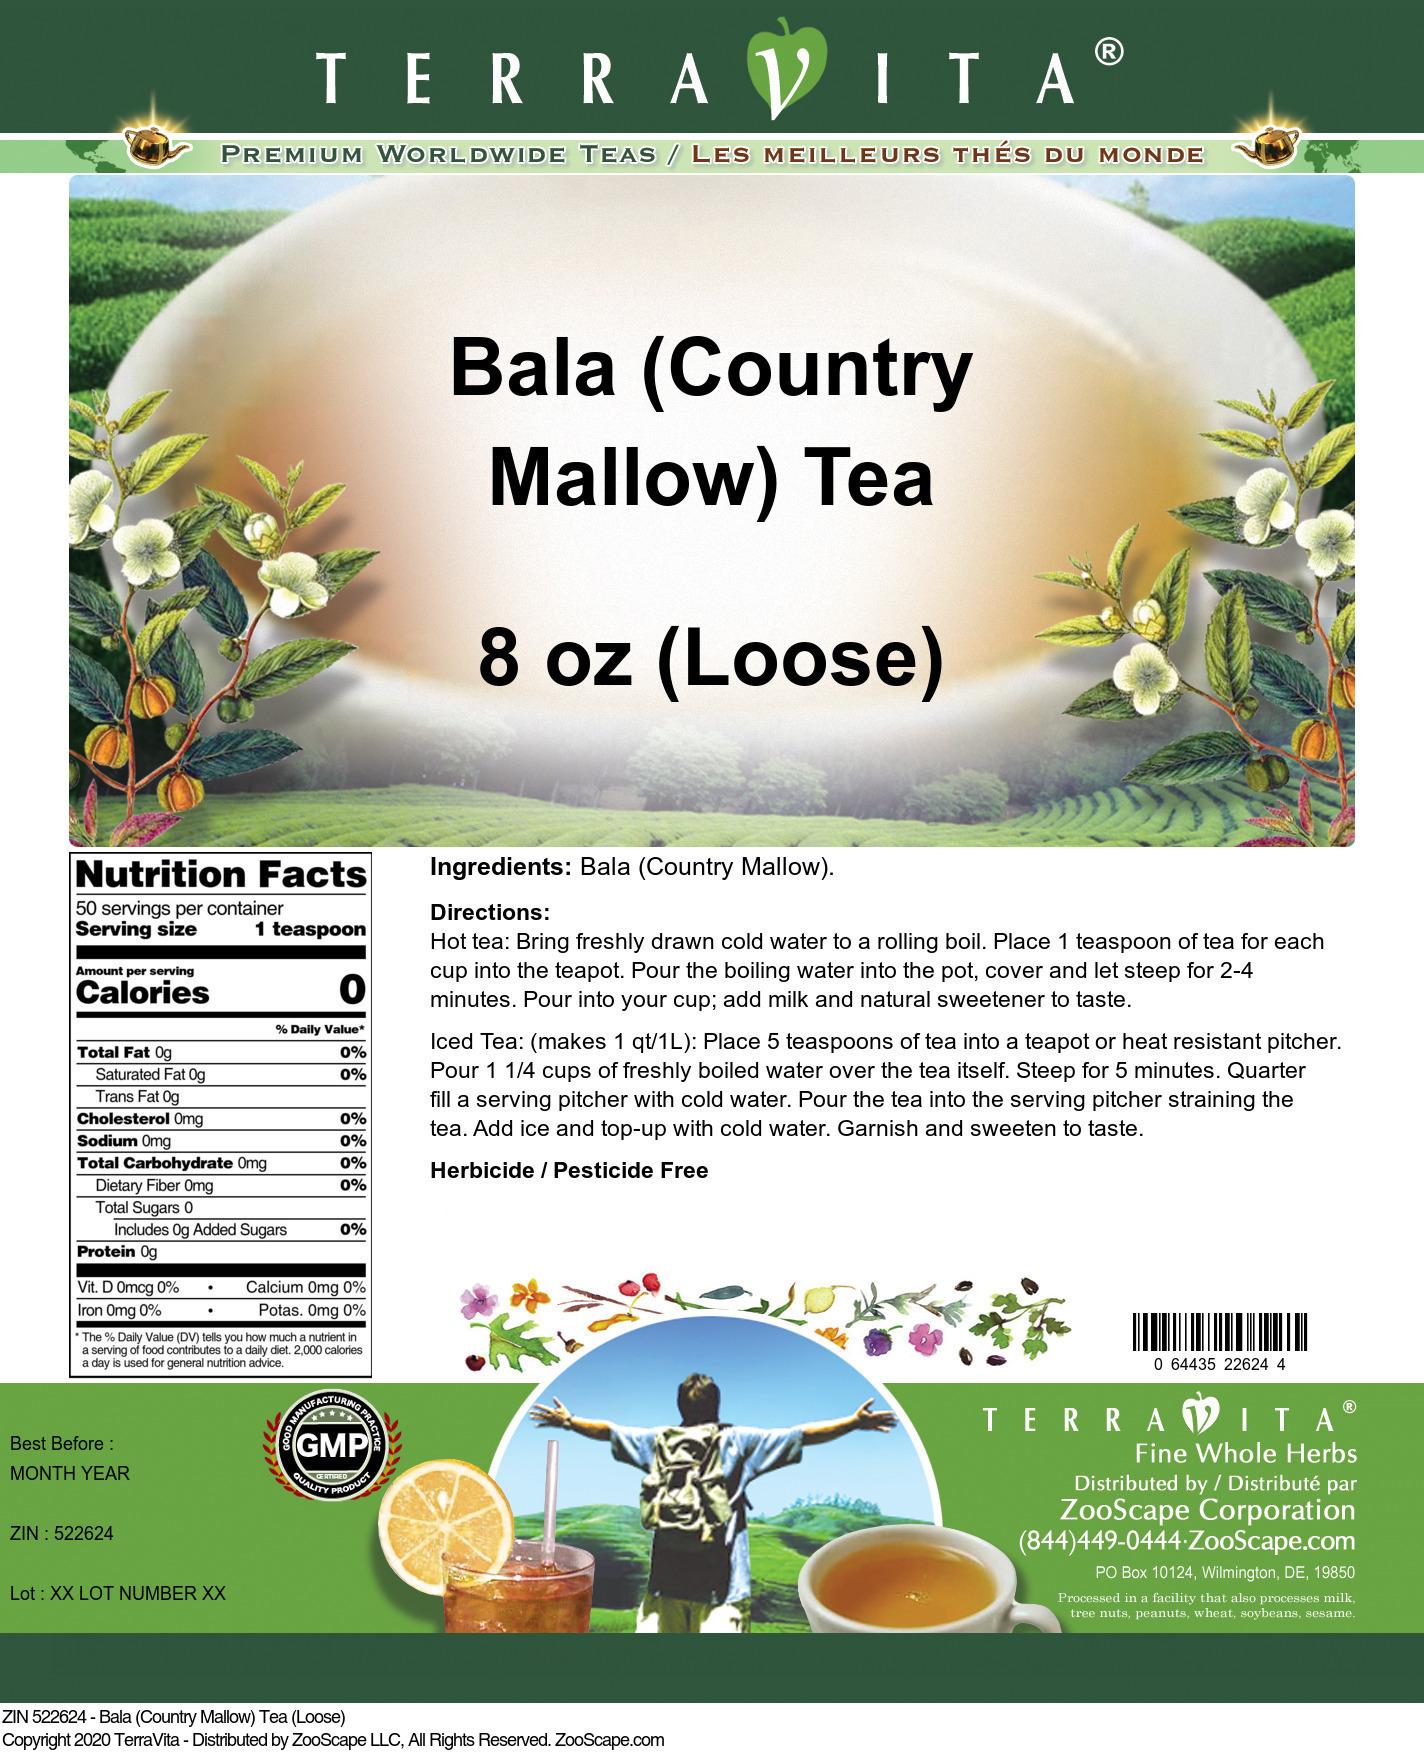 Bala (Country Mallow) Tea (Loose)